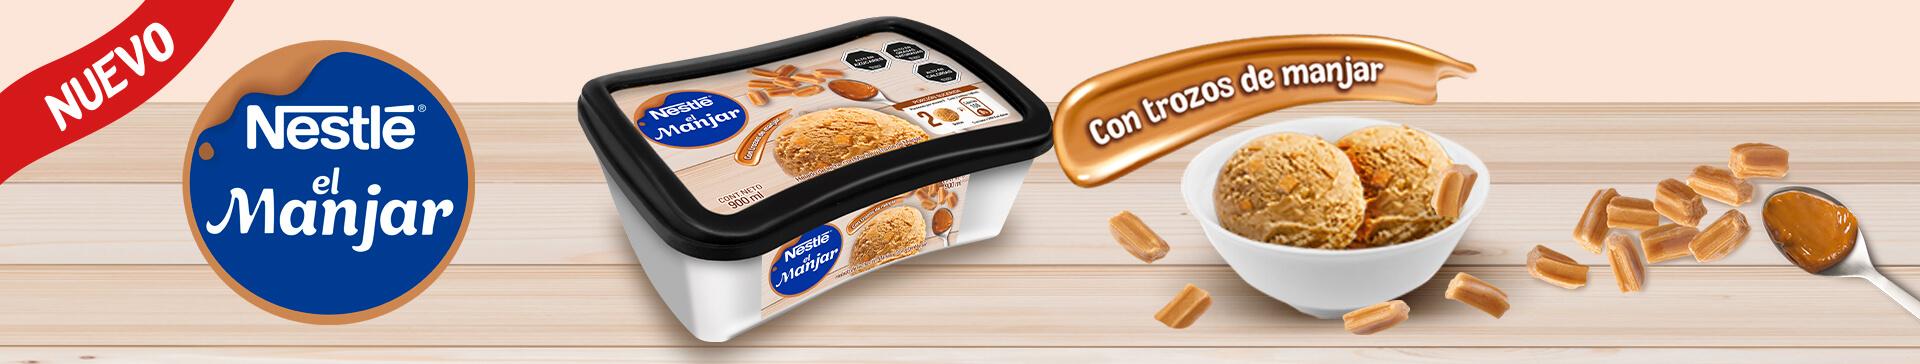 https://www.jumbo.cl/helado-el-manjar-premium-900-ml/p?nombre_promo=helados-manjar-25112020